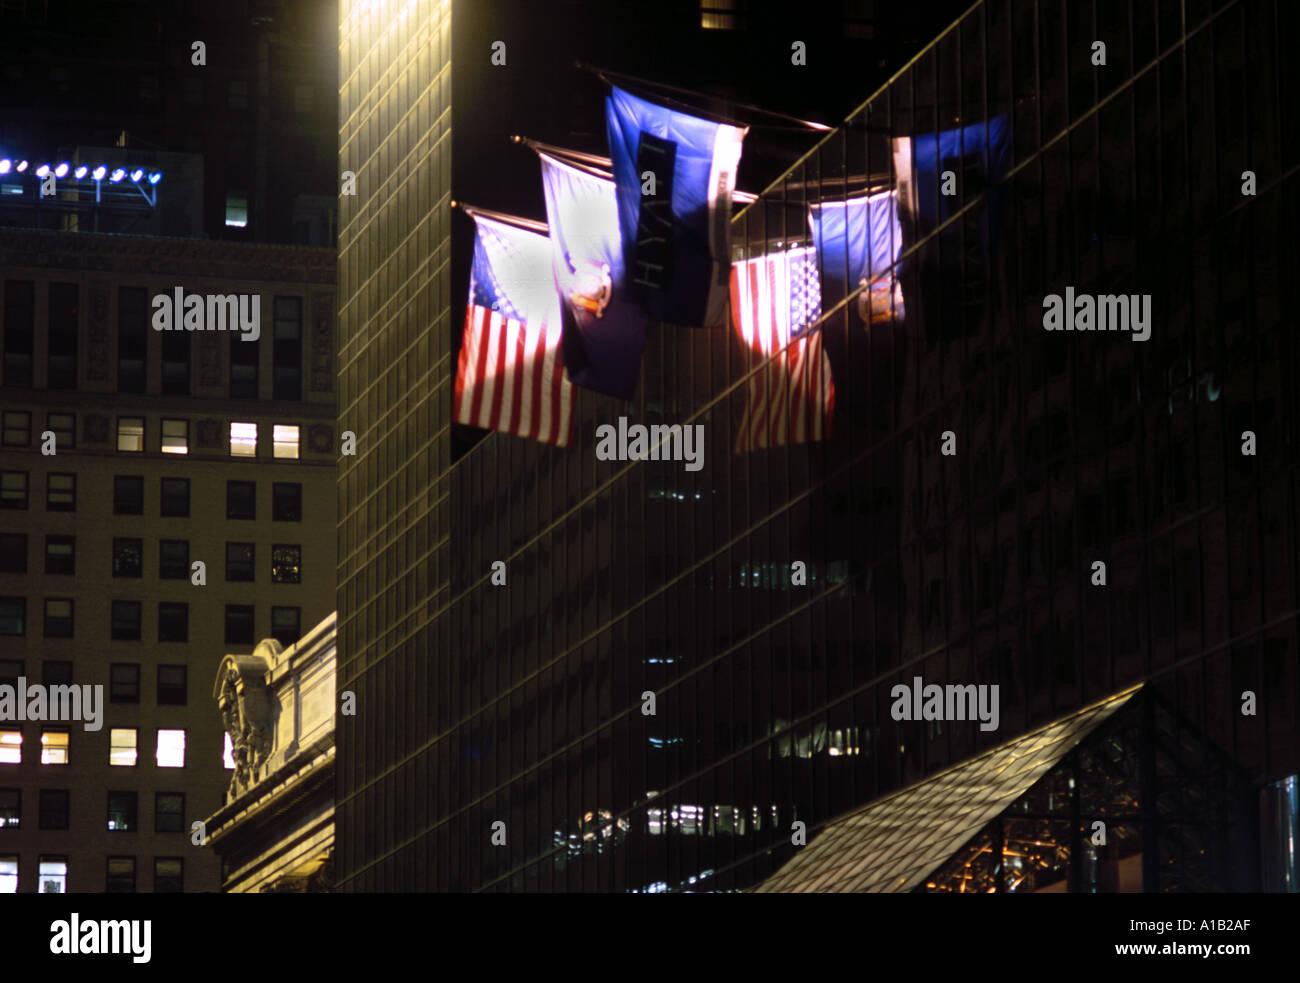 Flags flying at night outside New York City Grand Hyatt Hotel USA - Stock Image